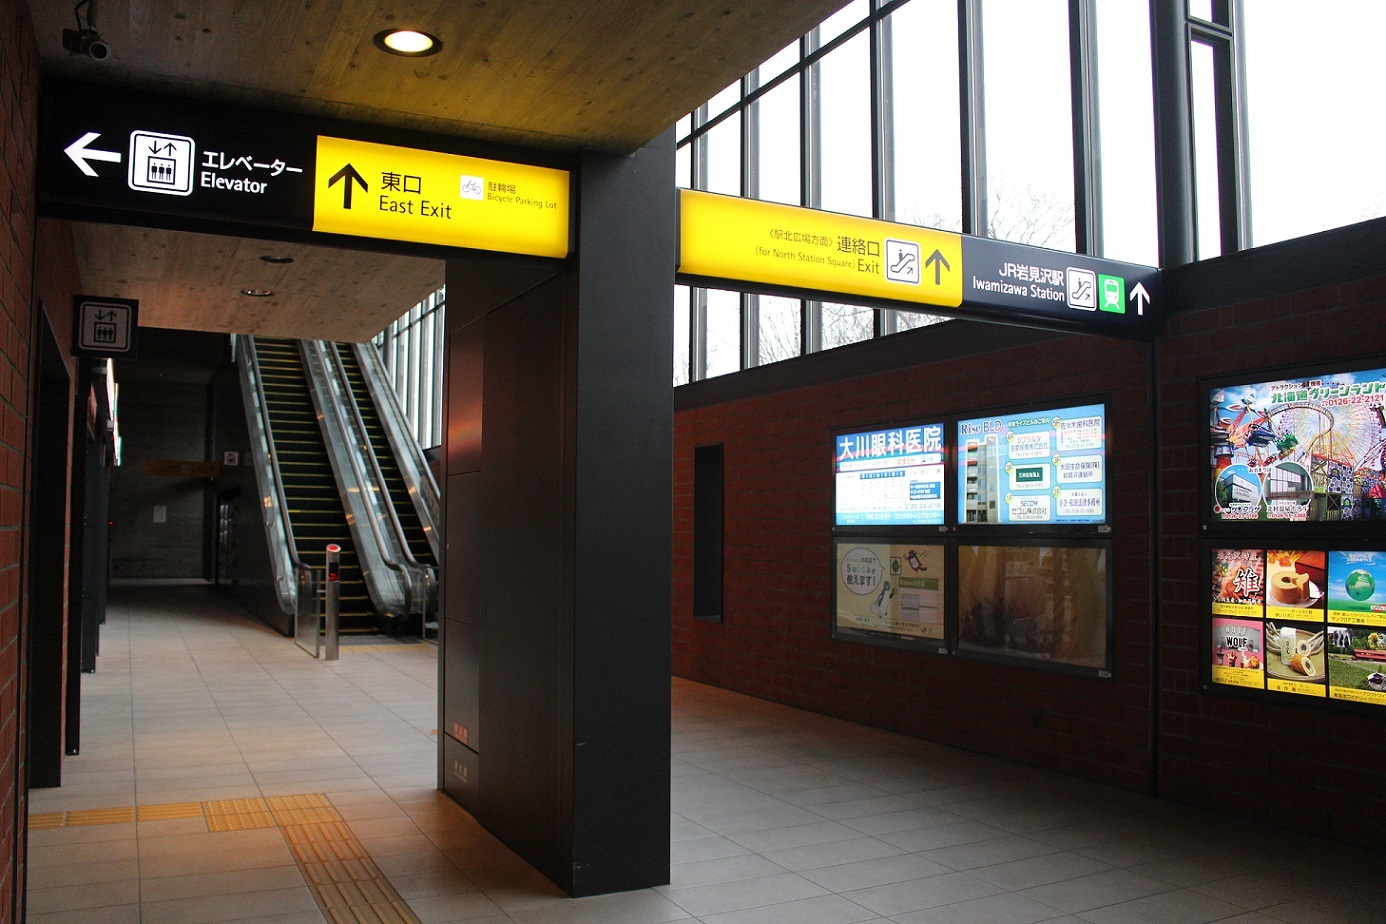 岩見沢駅a119